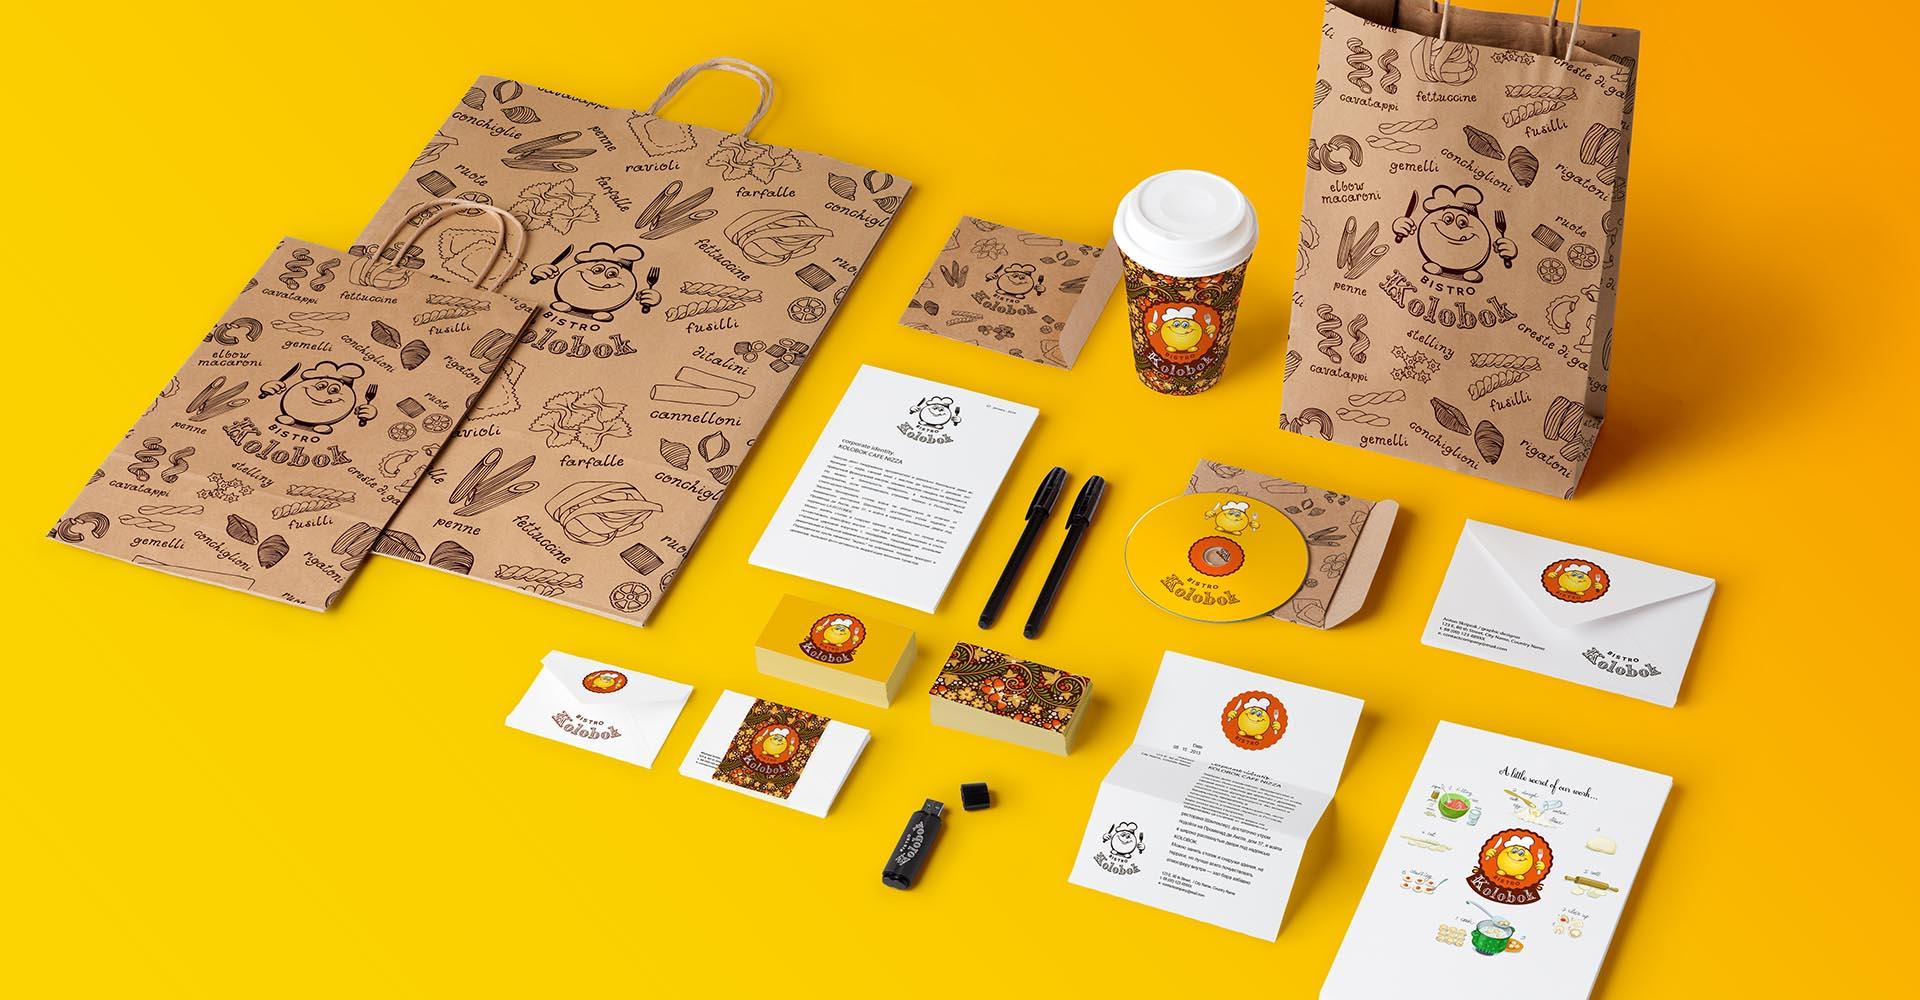 фирменный стиль кафе, дизайн логотипа бистро, Франция, Ницца Corporate style cafe, bistro logo design, France, Nice